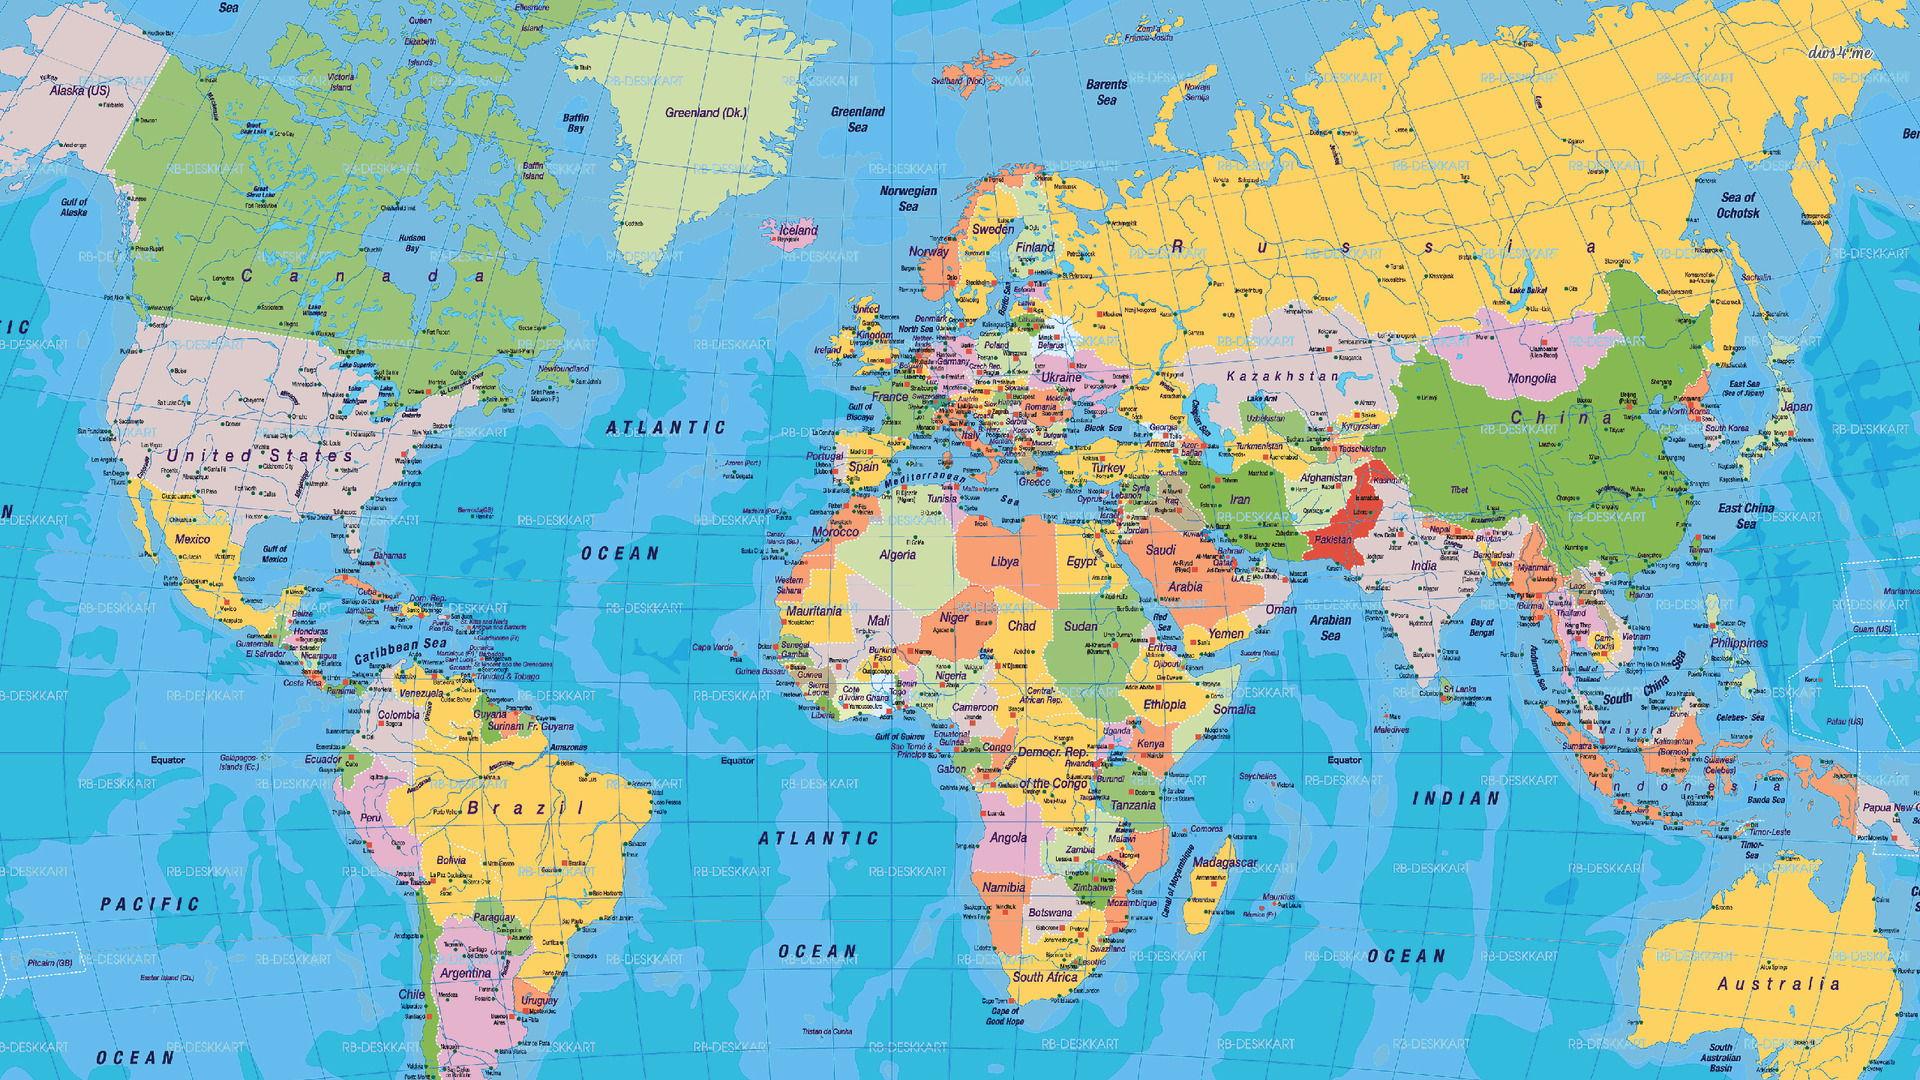 1920x1080px world globe wallpaper wallpapersafari world map country names high resolution wallpaper download world 1920x1080 gumiabroncs Images